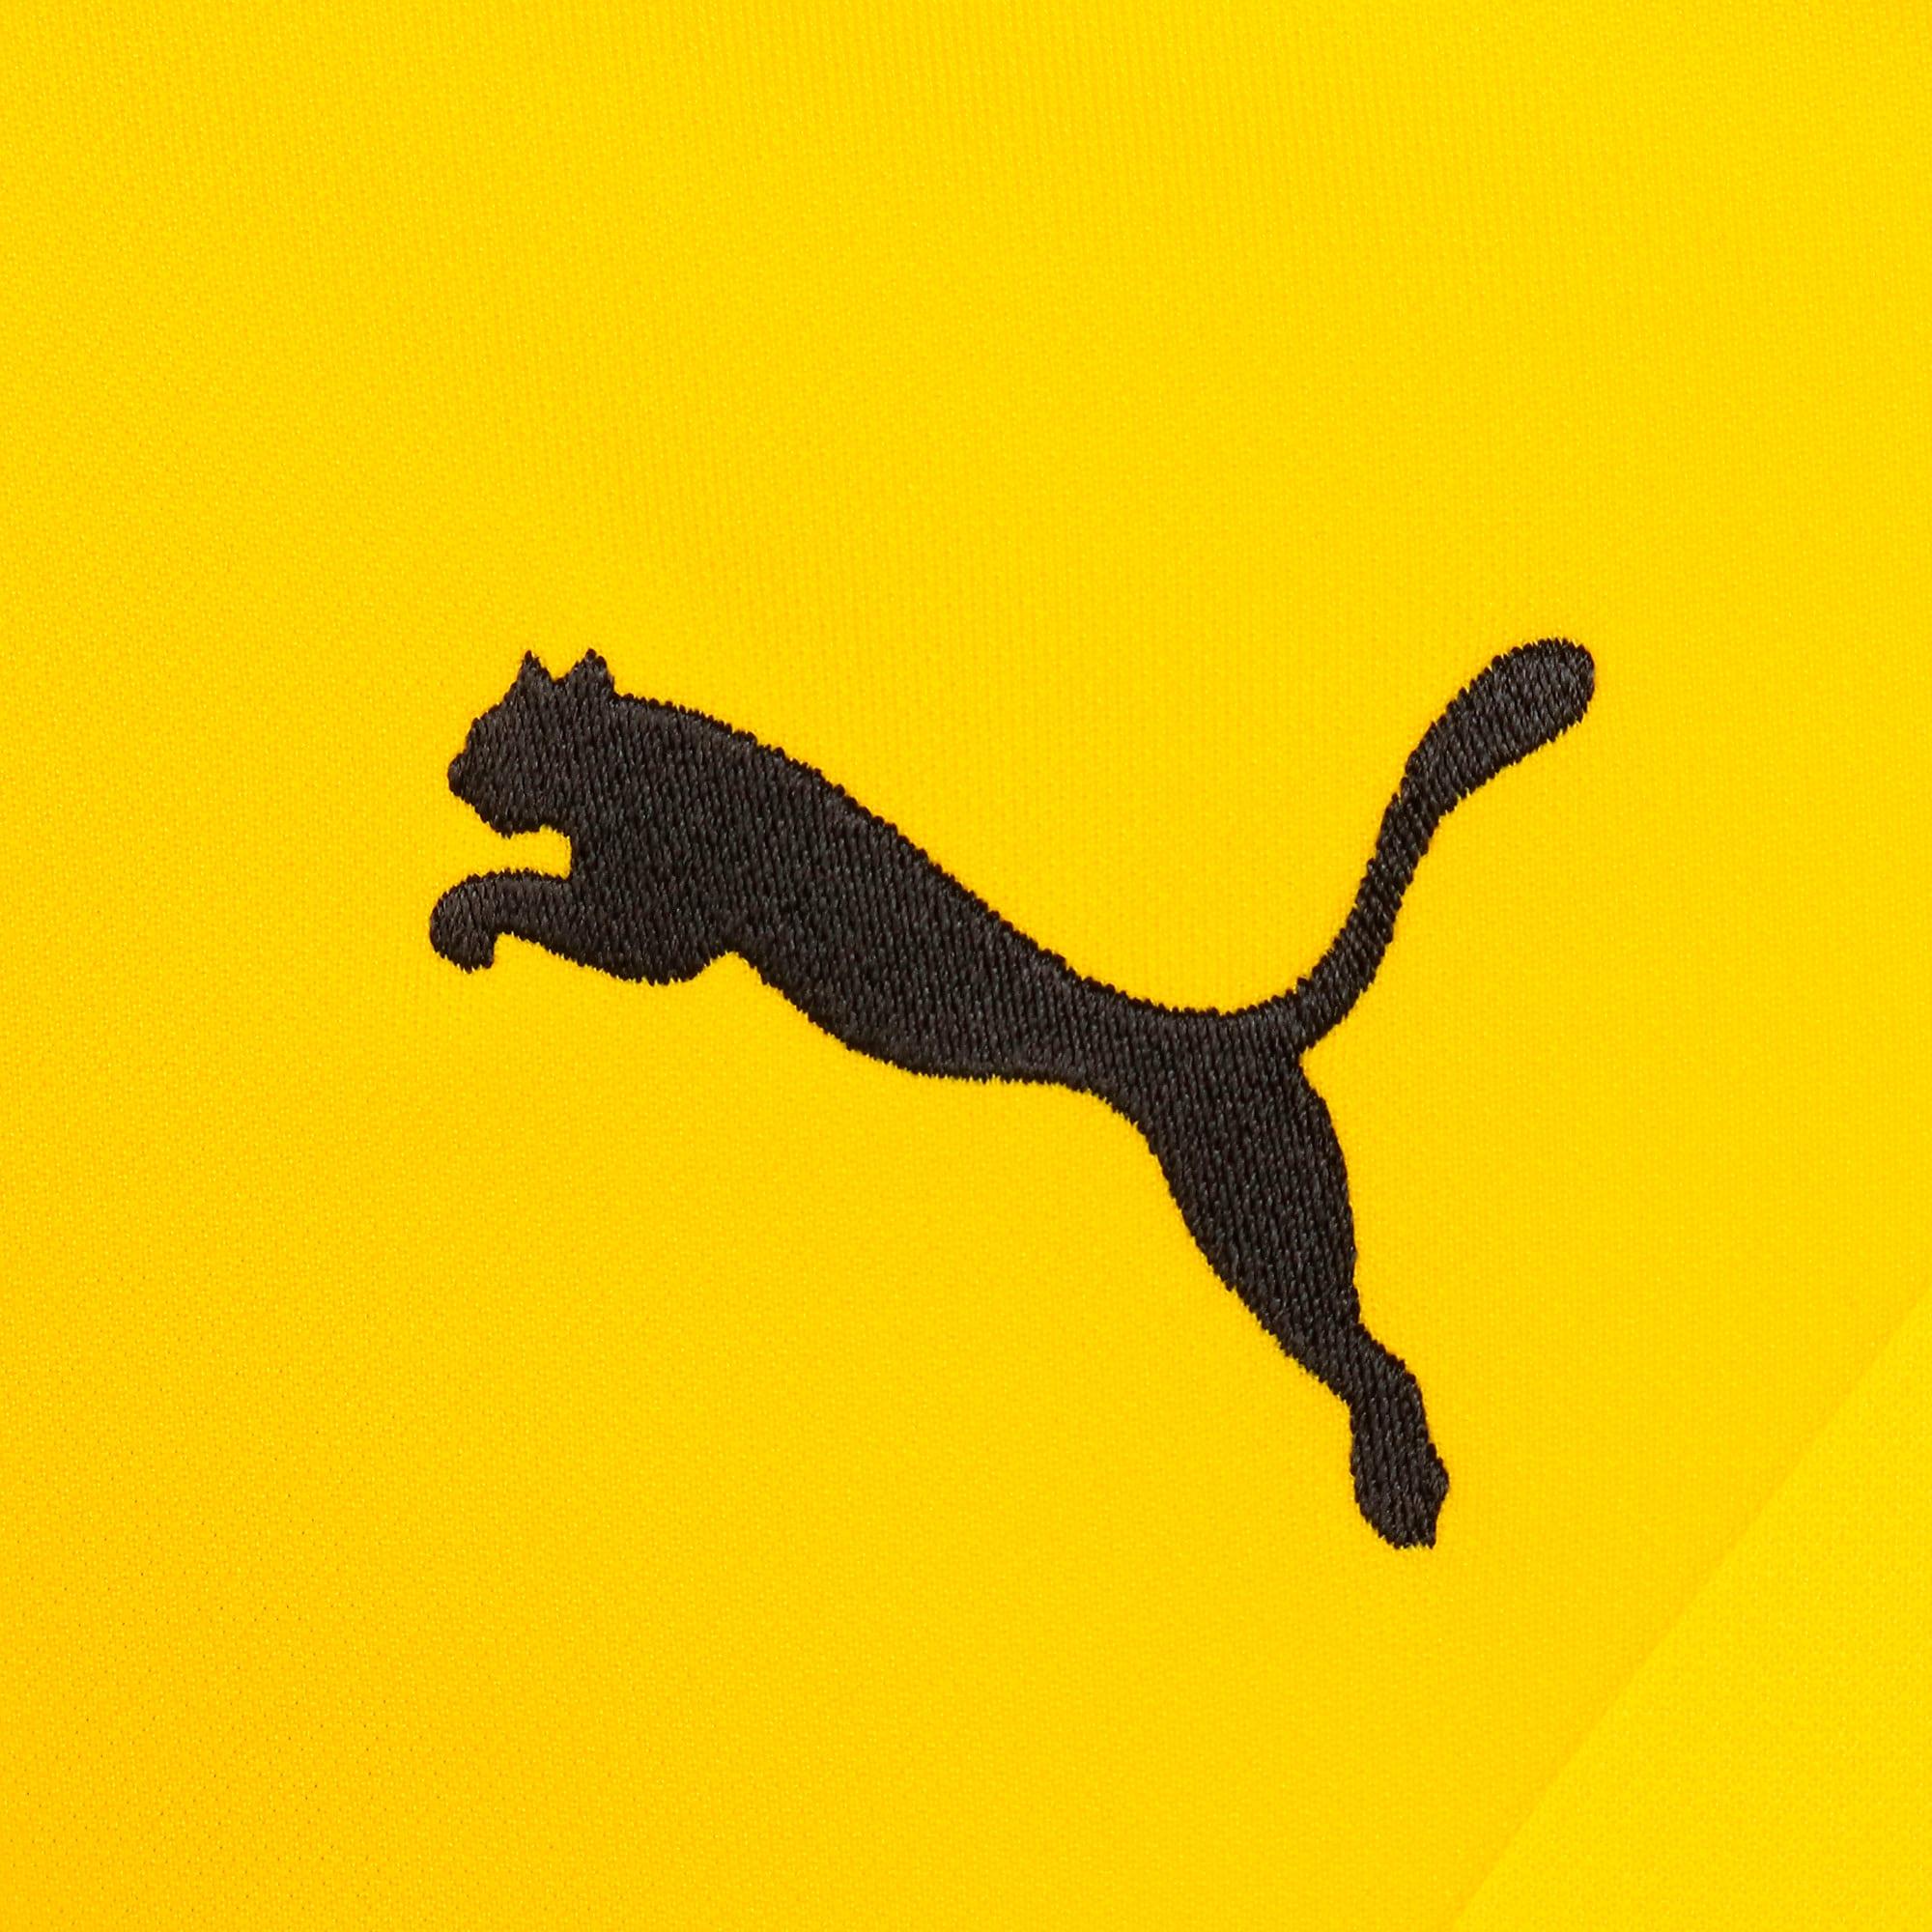 Thumbnail 4 of BVB LS ホーム レプリカシャツ, Cyber Yellow, medium-JPN